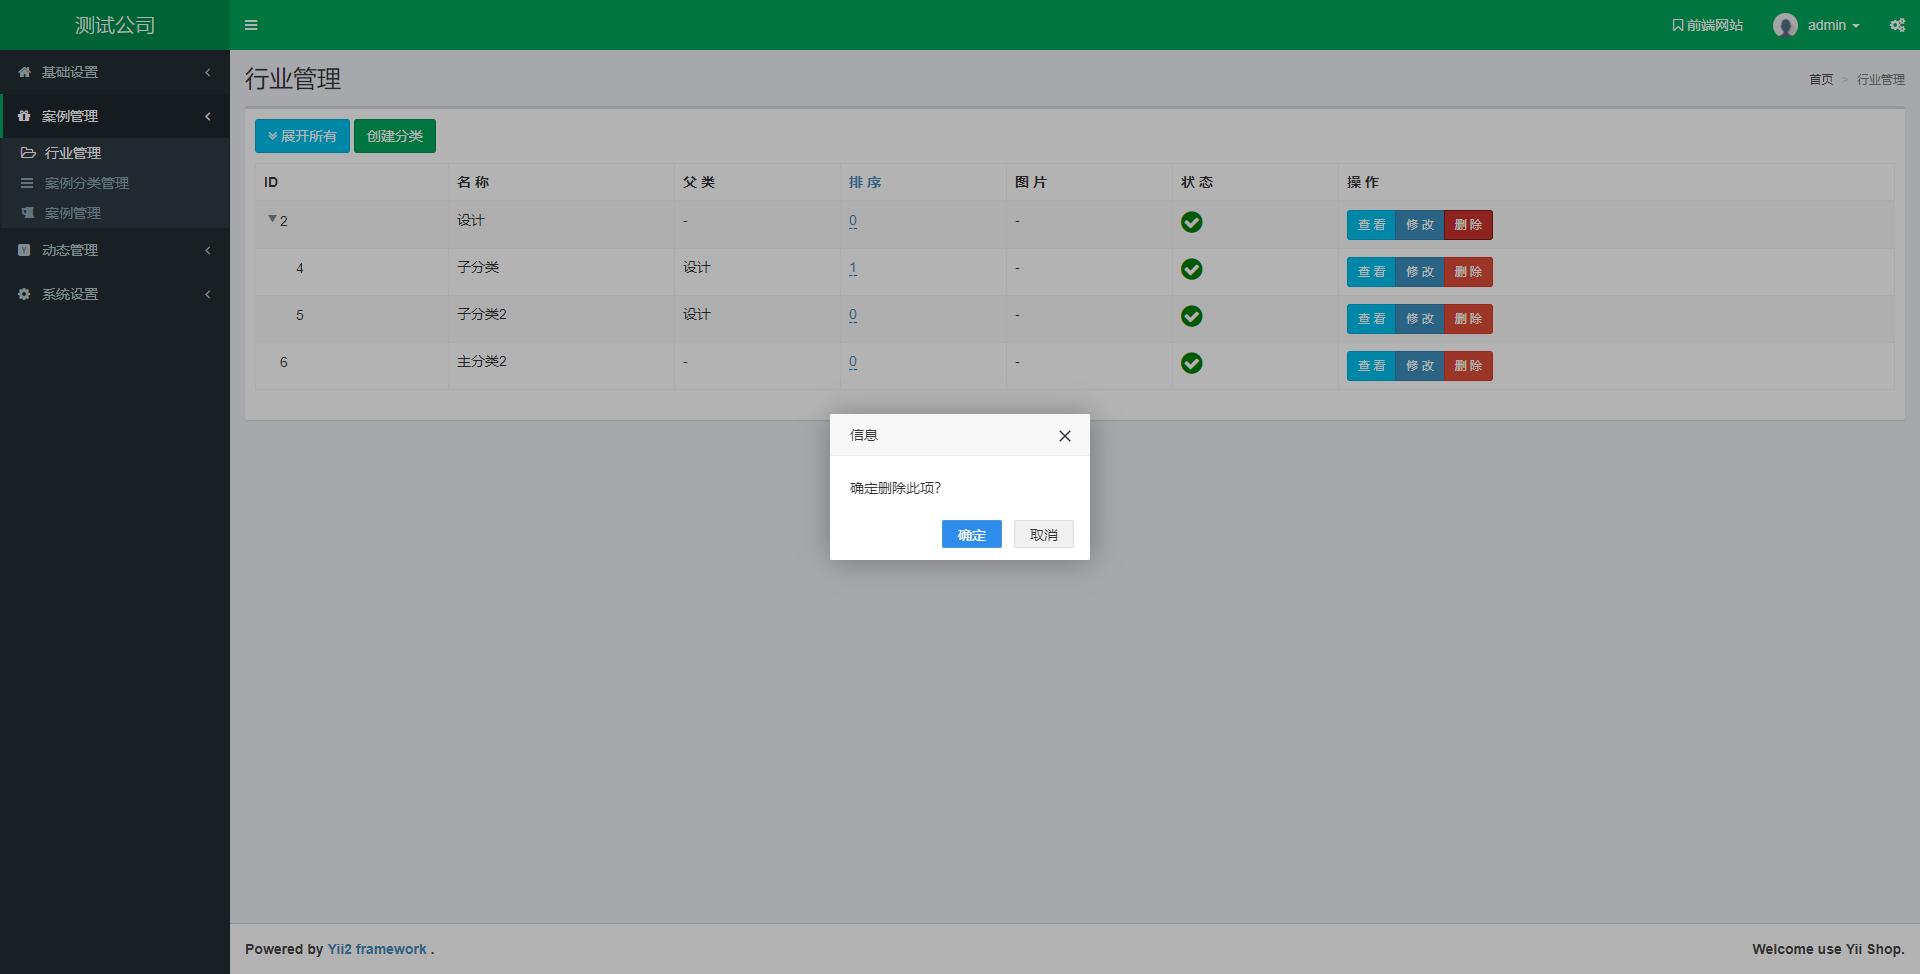 yii2-cms: yii2,cms,enterprise,yii,adminlte,rbac,upload